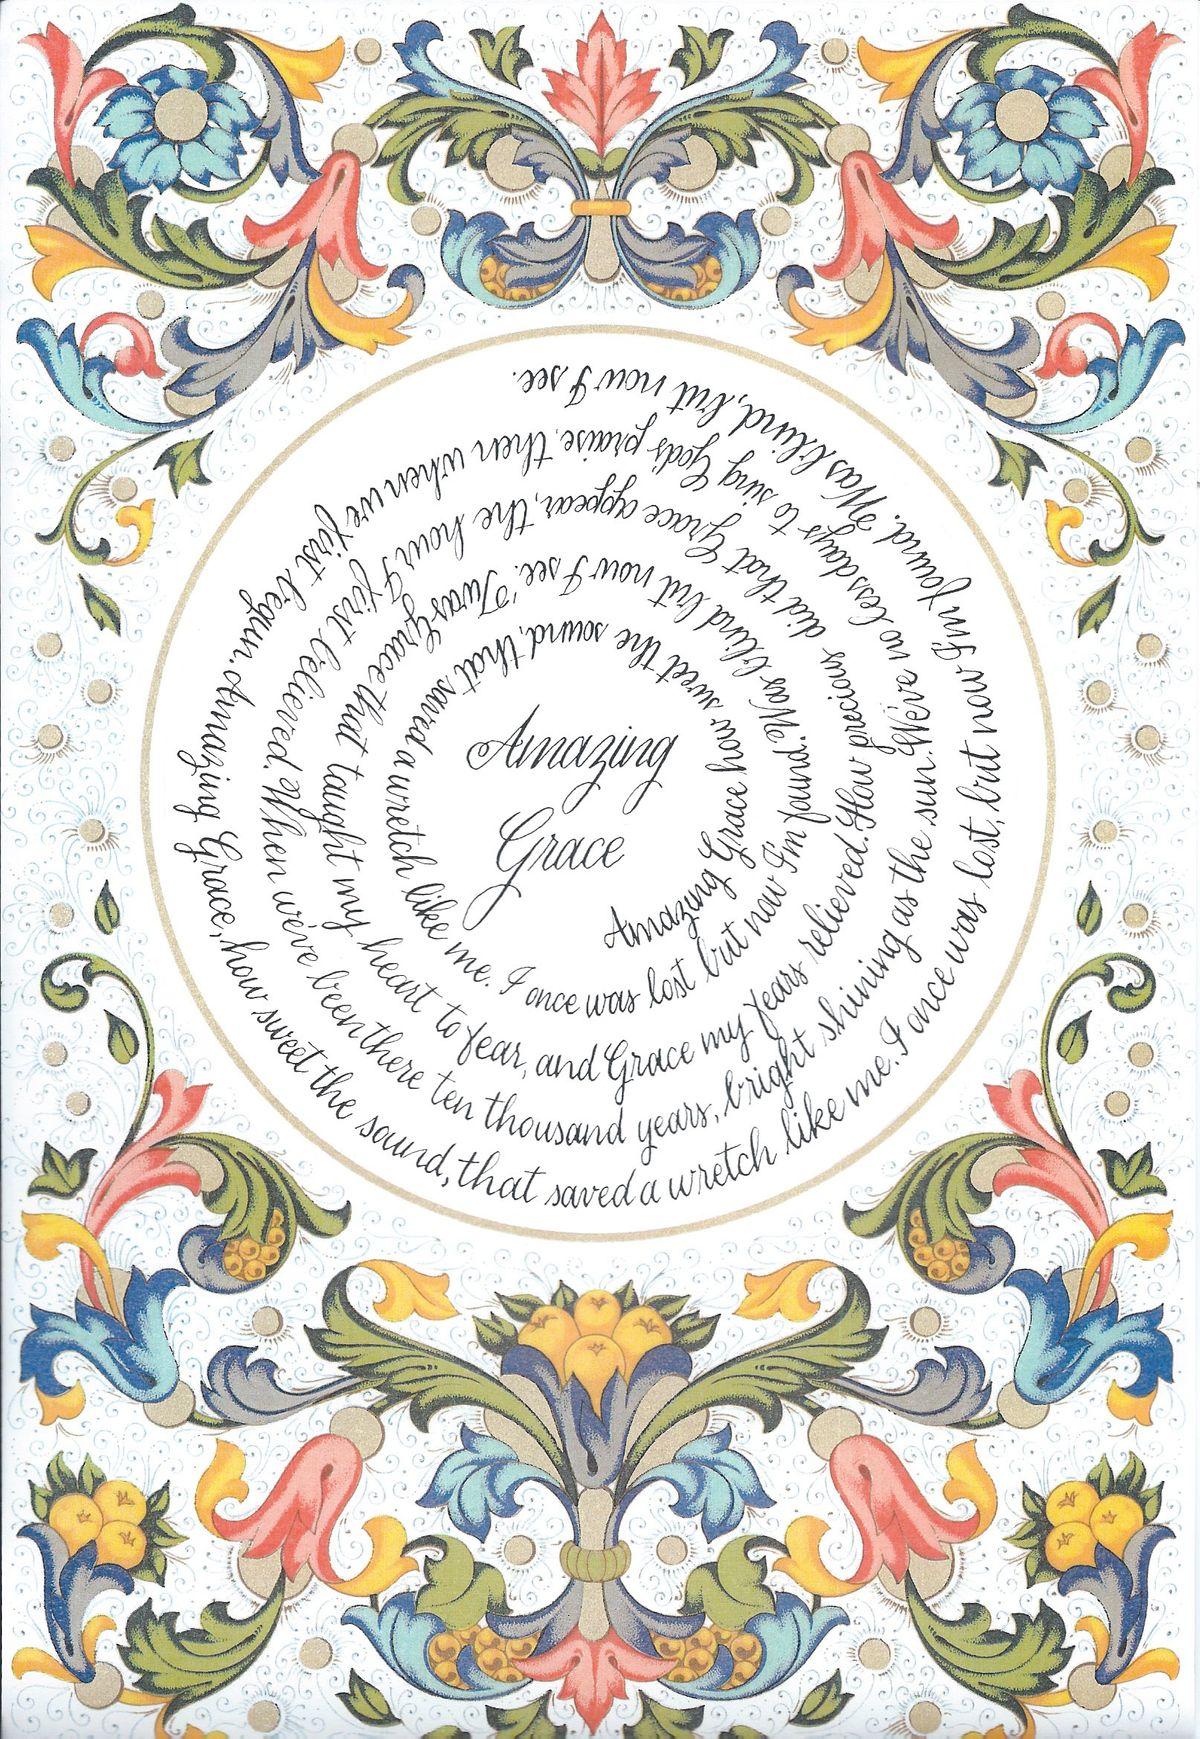 Amazing Grace - Spiral.jpg